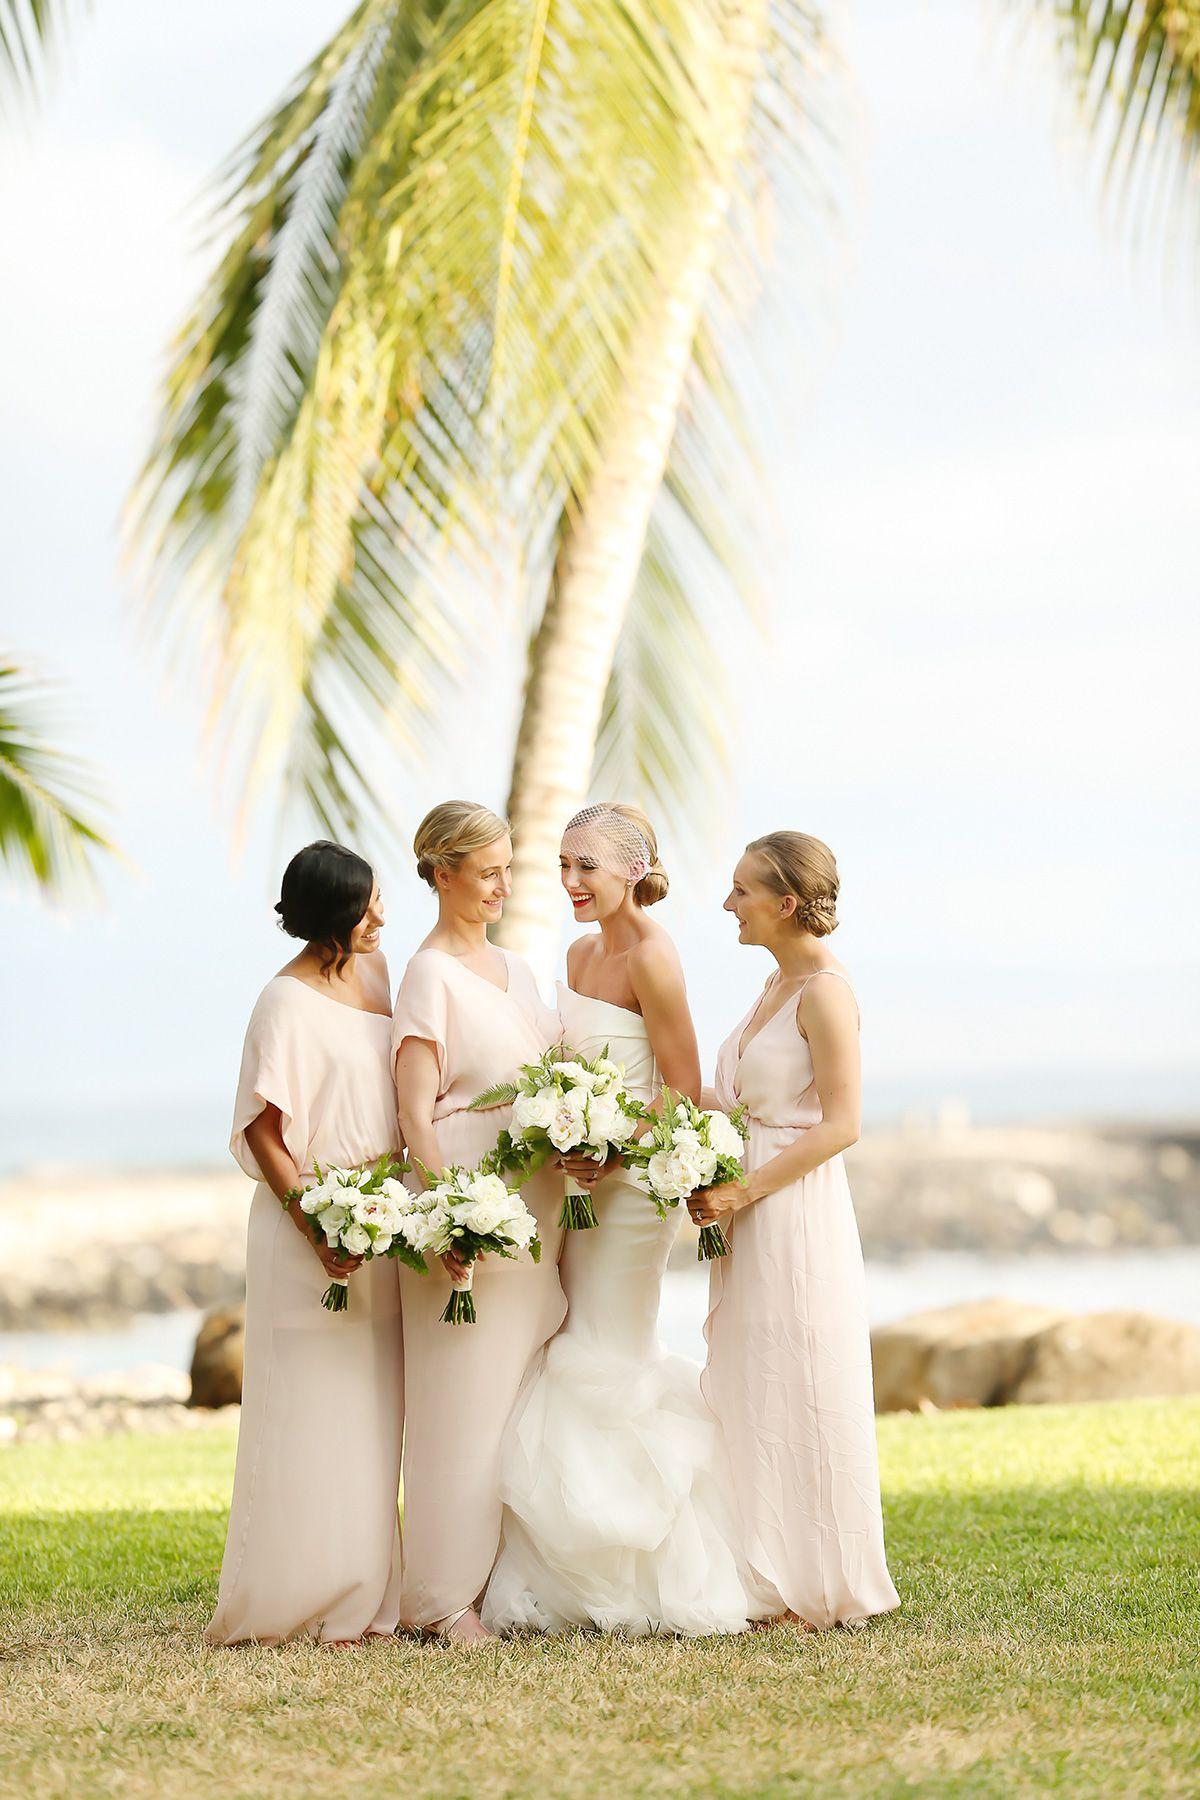 Best dresses to wear to a wedding reception  Wedding Guest Dresses eatsleepwear  Olowalu plantation house